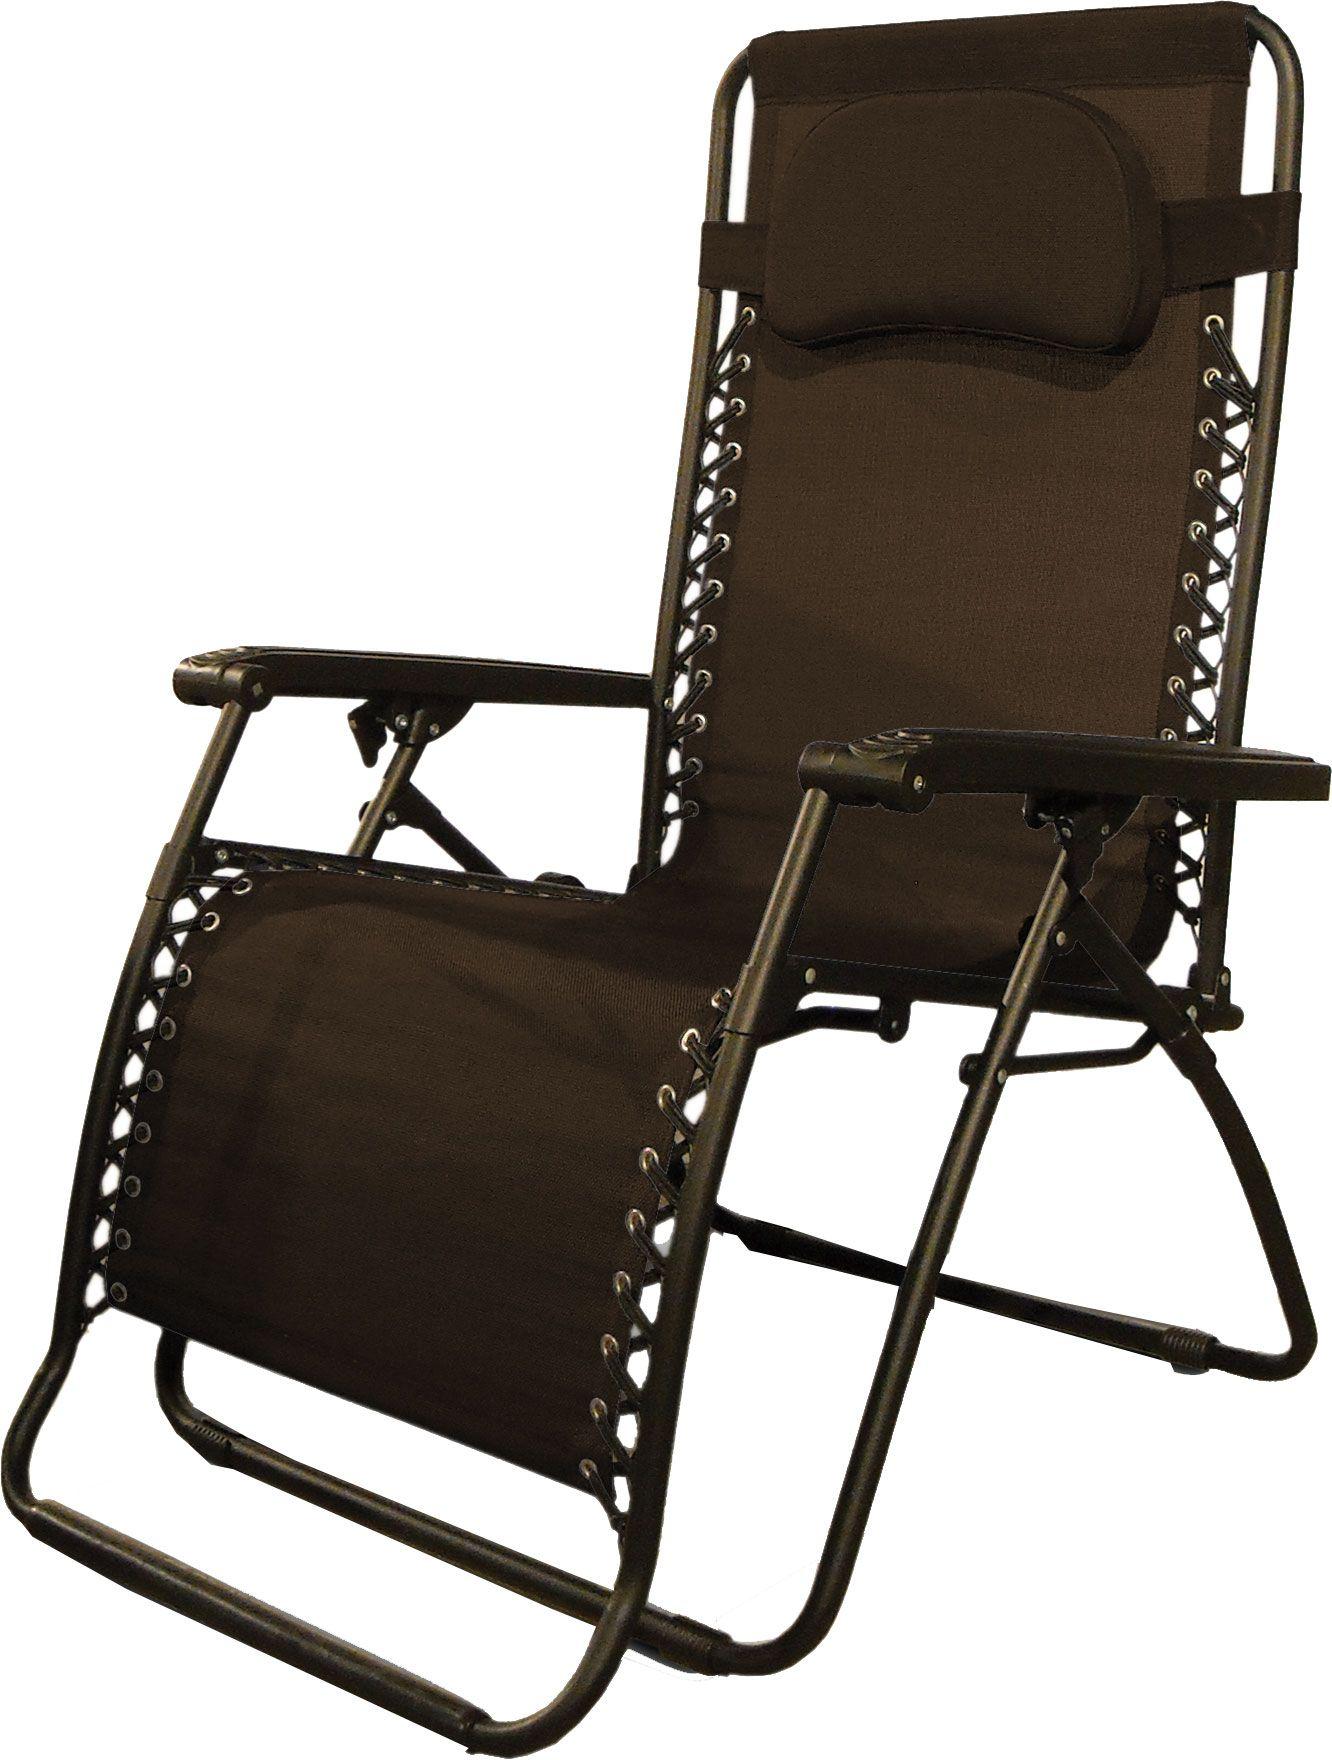 Folding patio chairs - Product Image Caravan Oversized Infinity Zero Gravity Chair